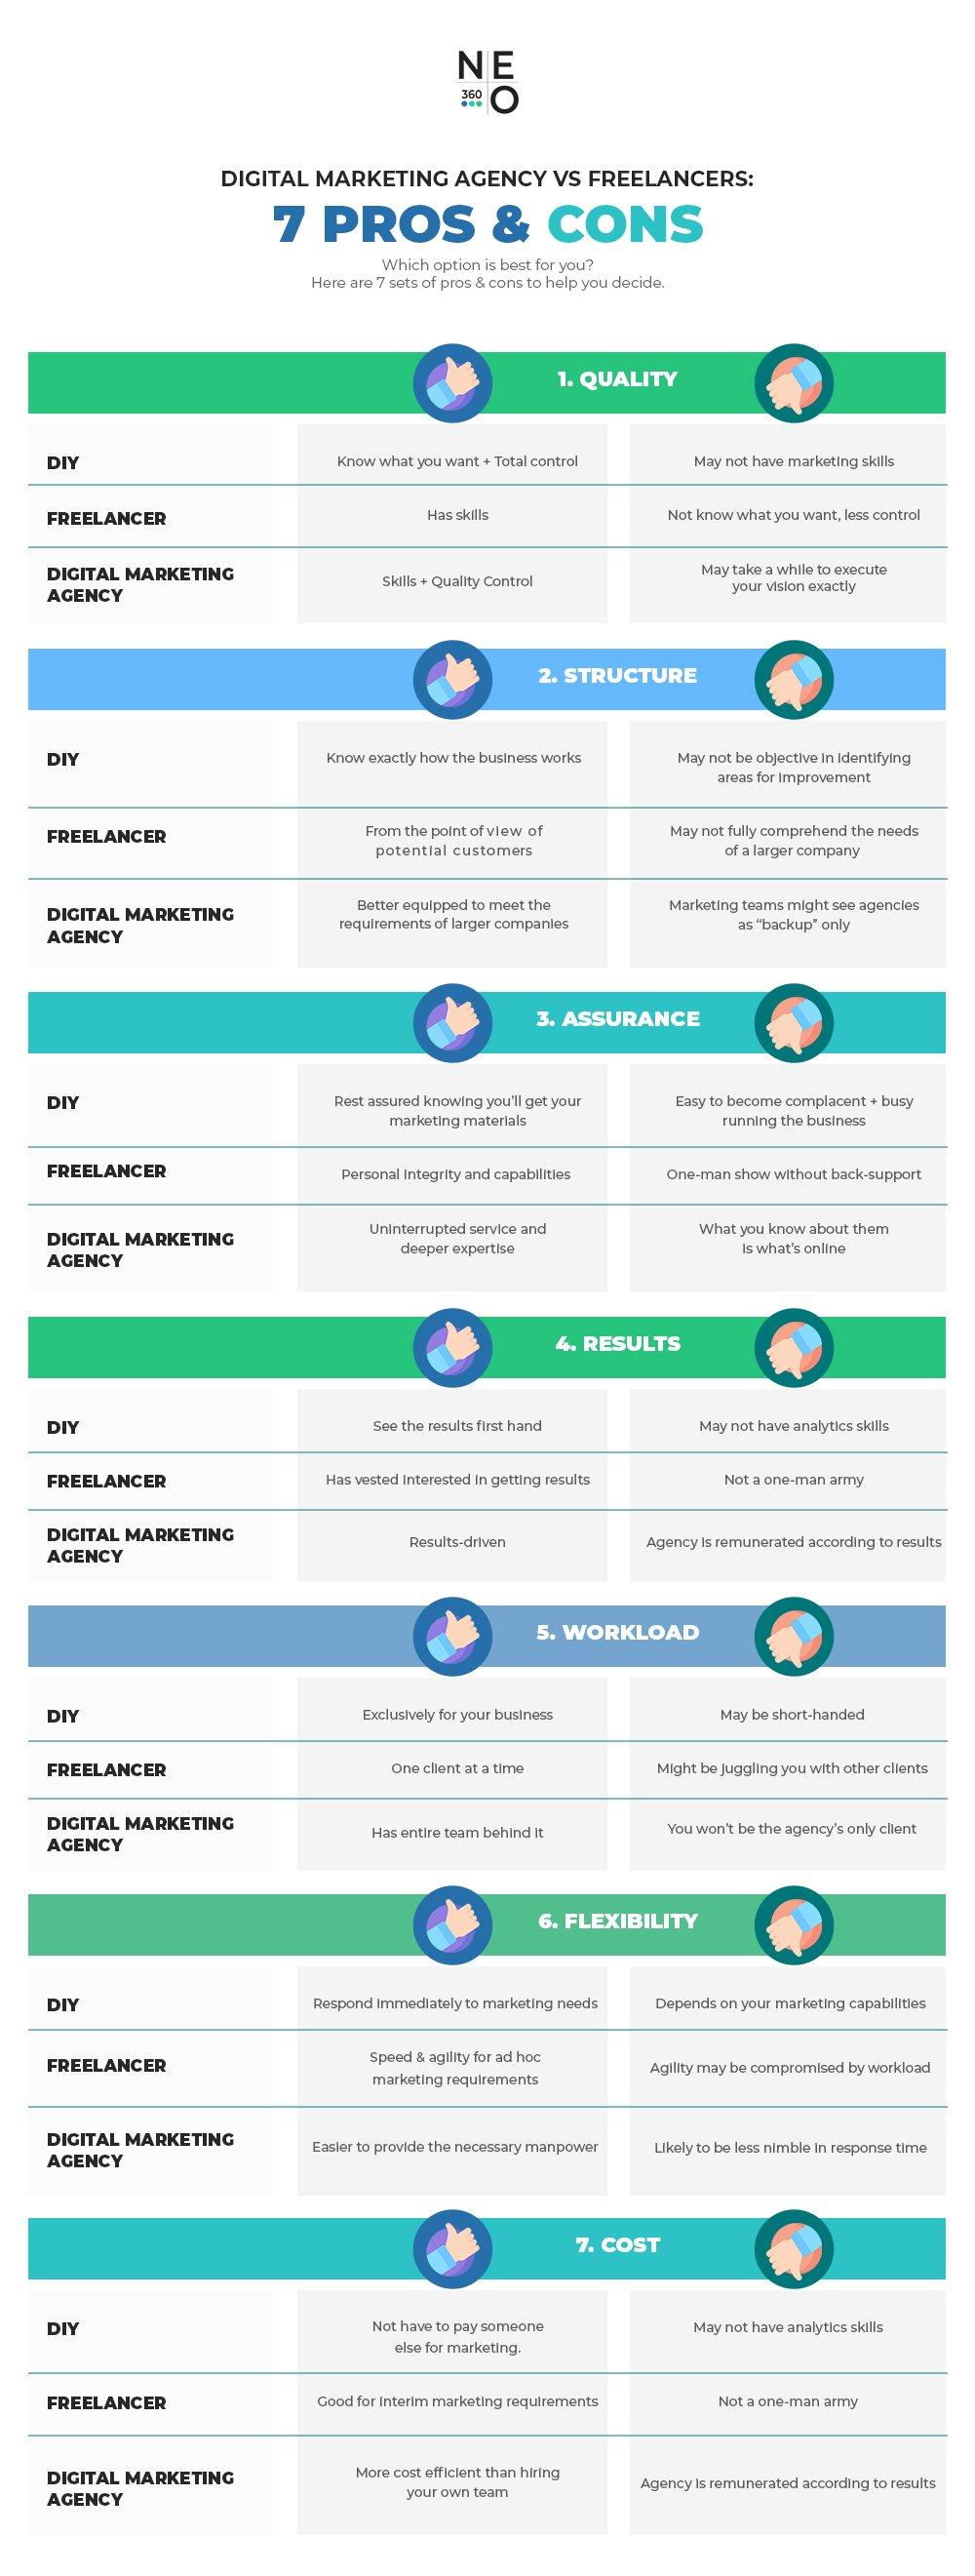 pros-&-cons-infographic-freelancers-vs-digital-marketing-agency-NEO360